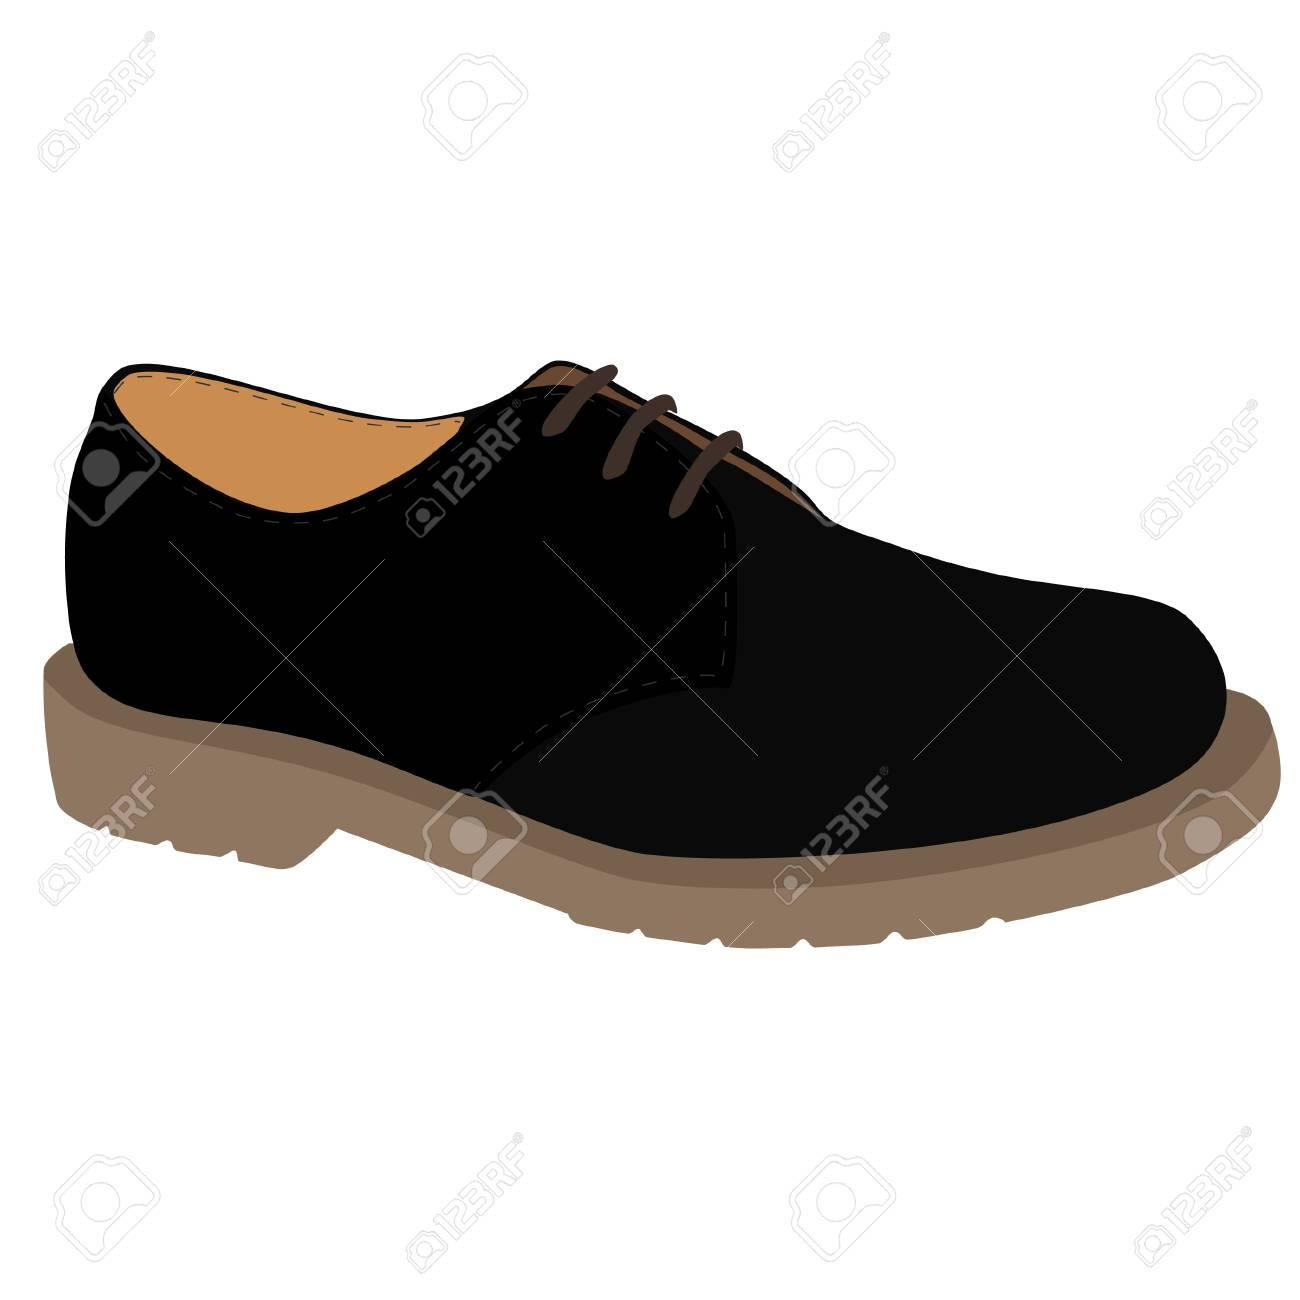 Noir Cuir Chaussures Sport De En Icône Isolé Raster Mode lJ1c3TFK